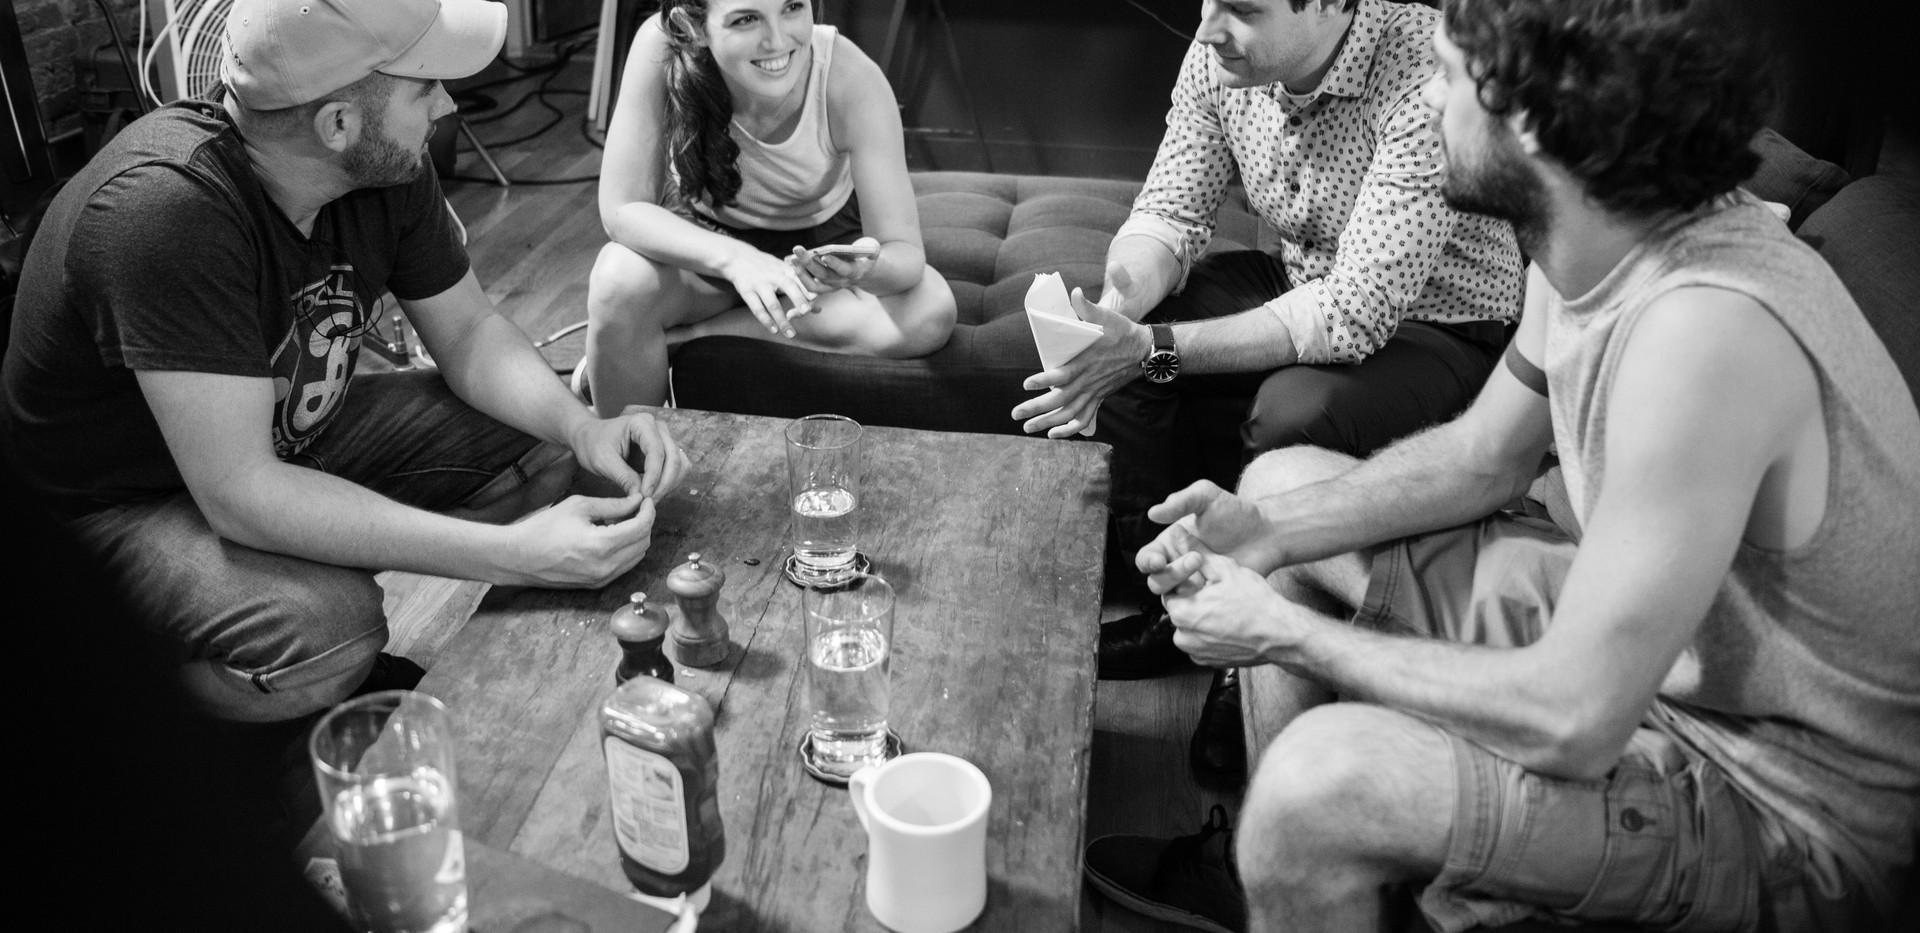 With Dani Tenenbaum, Ben Rappaport, and Jay DeYonker on the set of Landing Up